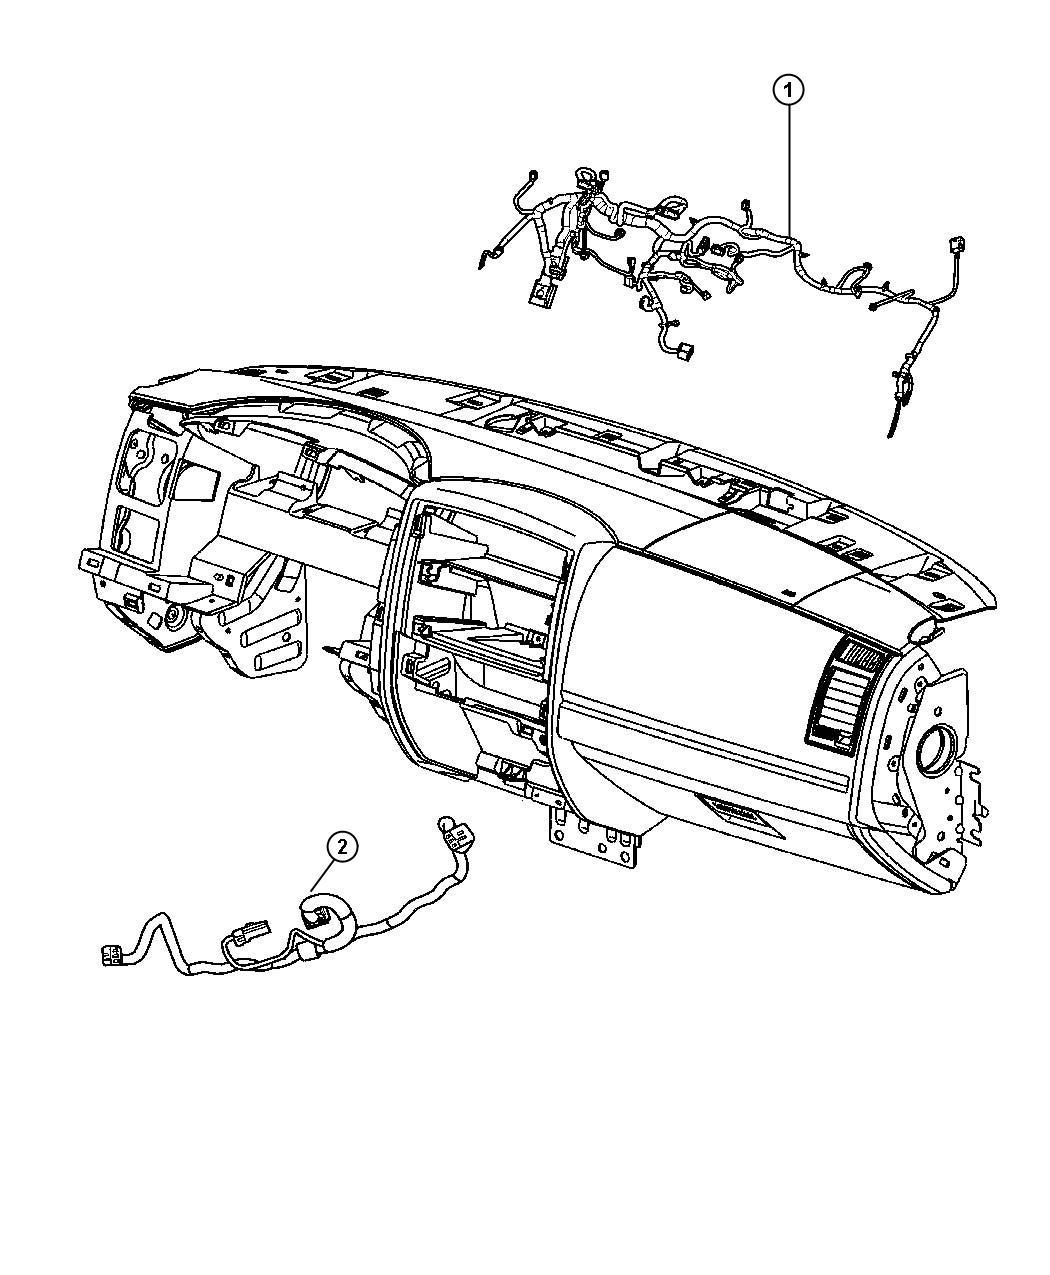 Dodge Dakota Wiring. Instrument panel. [sirius satellite